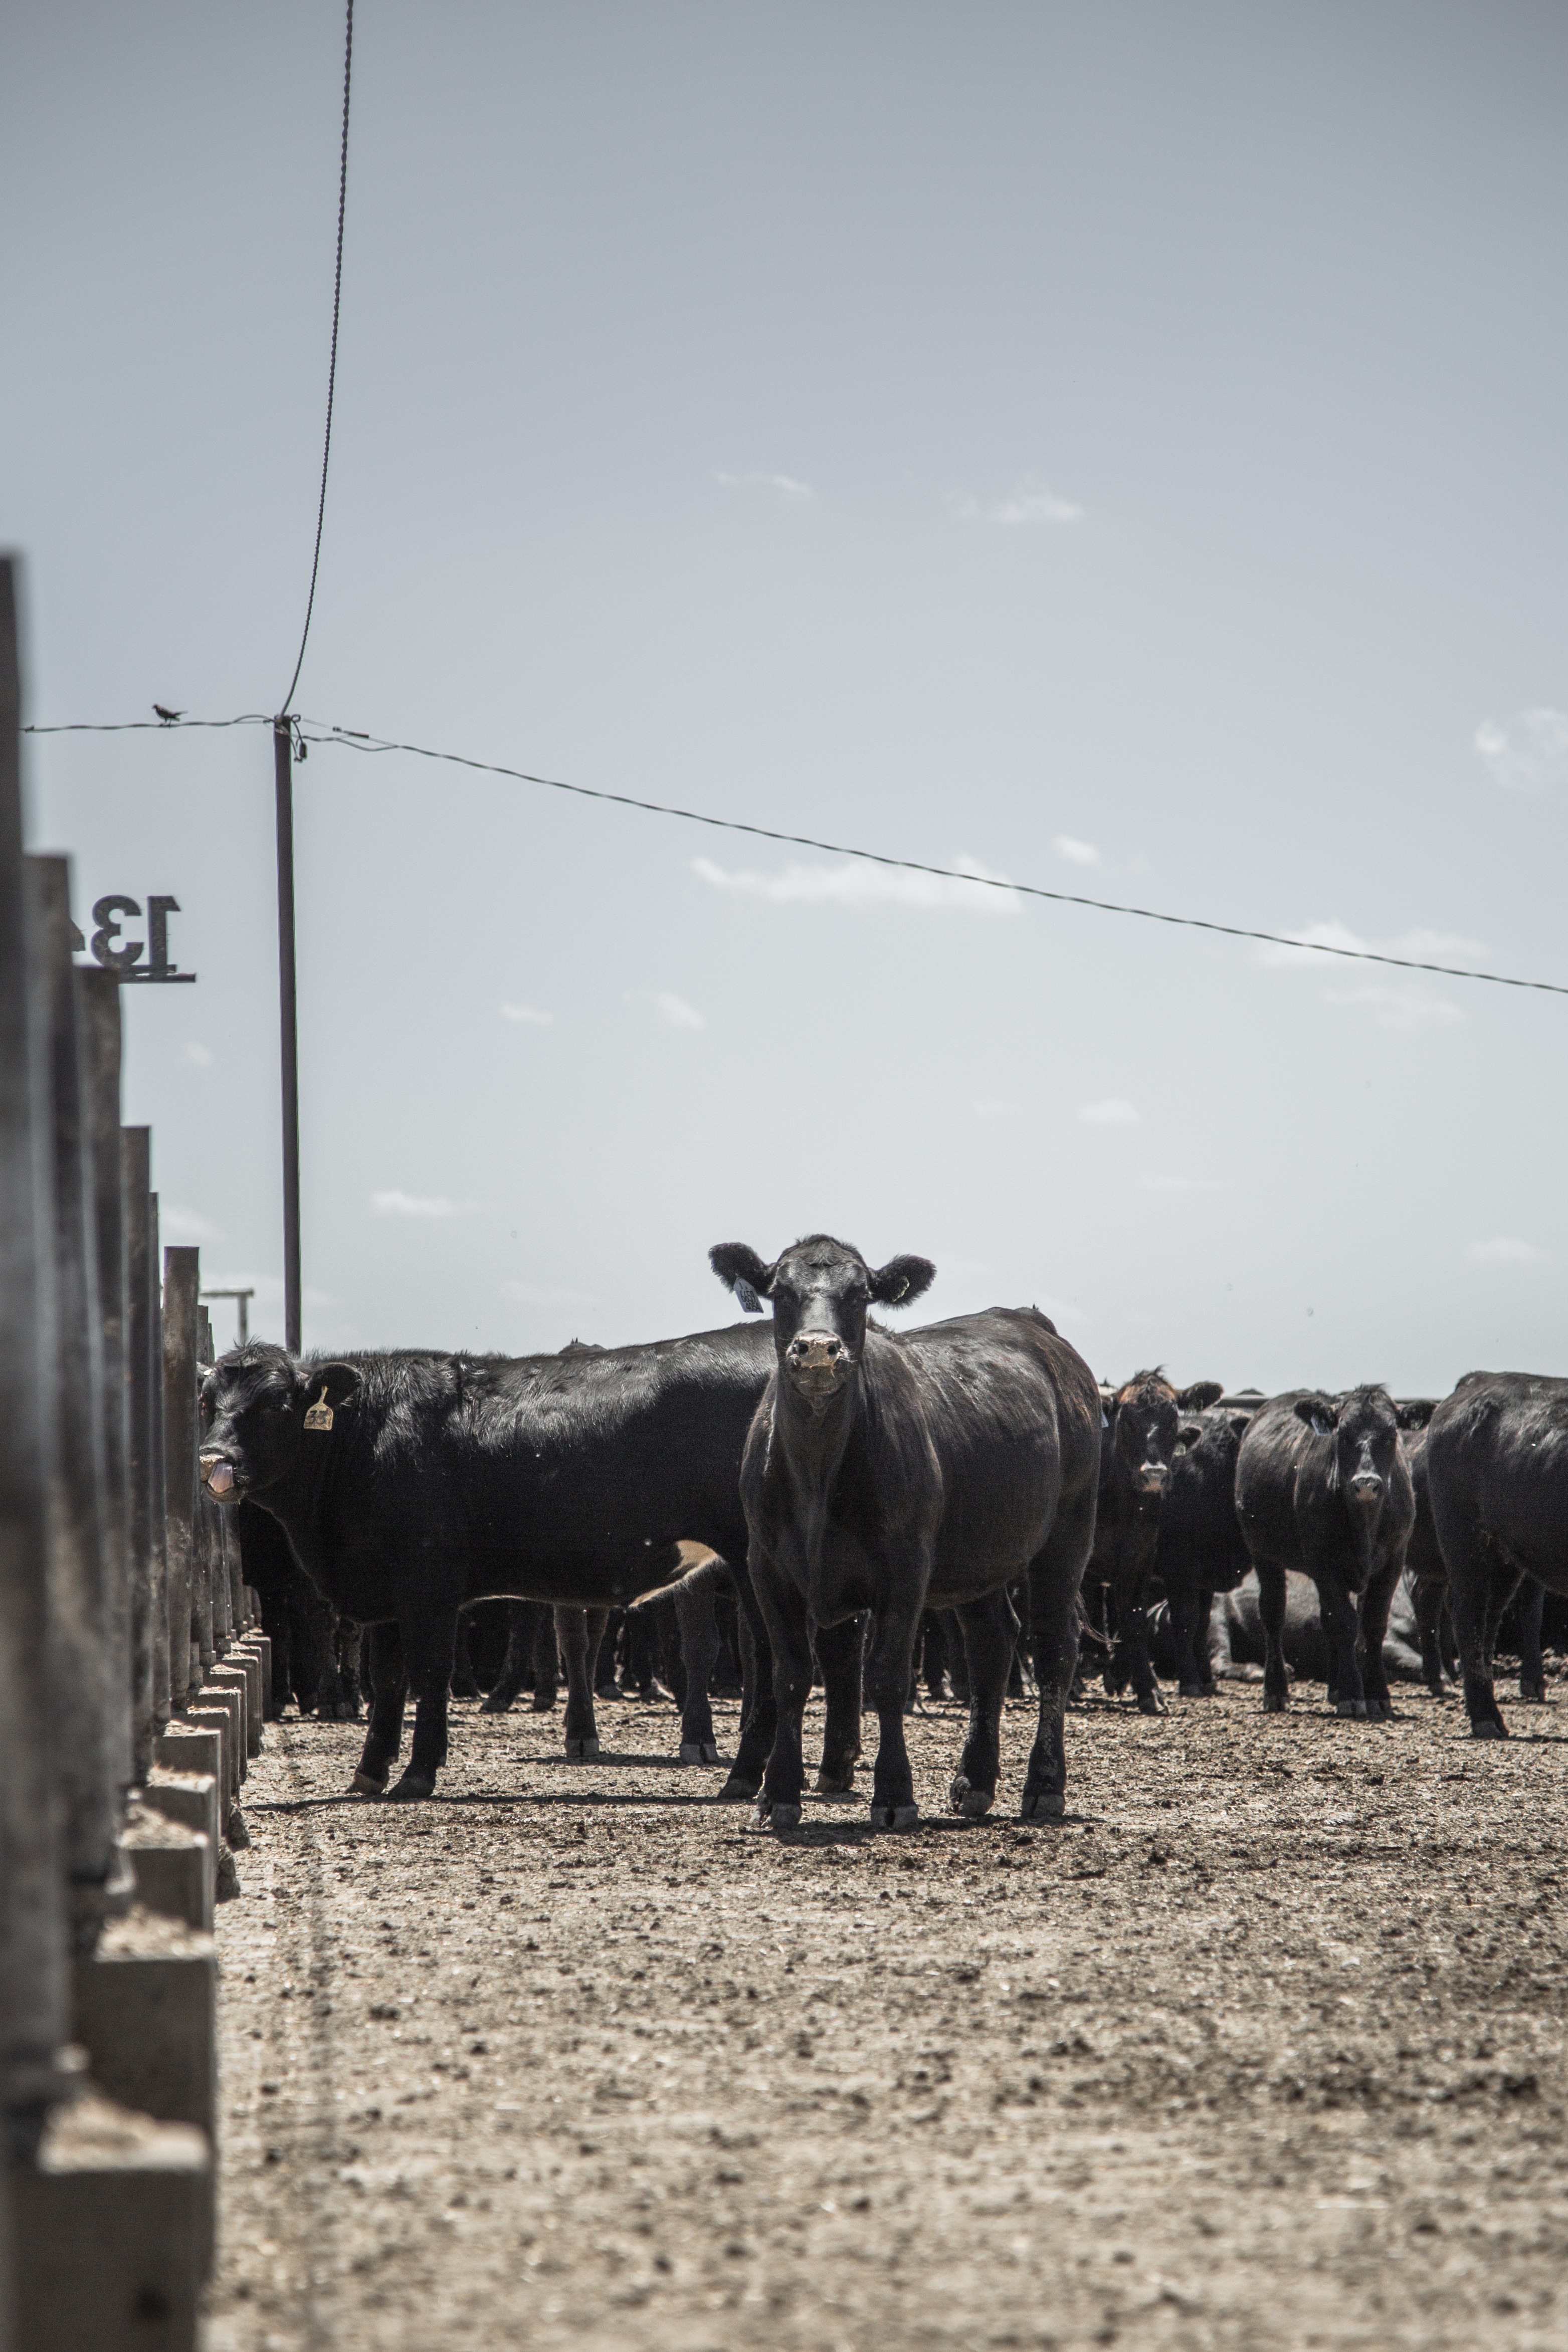 beef cattle veterinarian dr - HD3128×4692